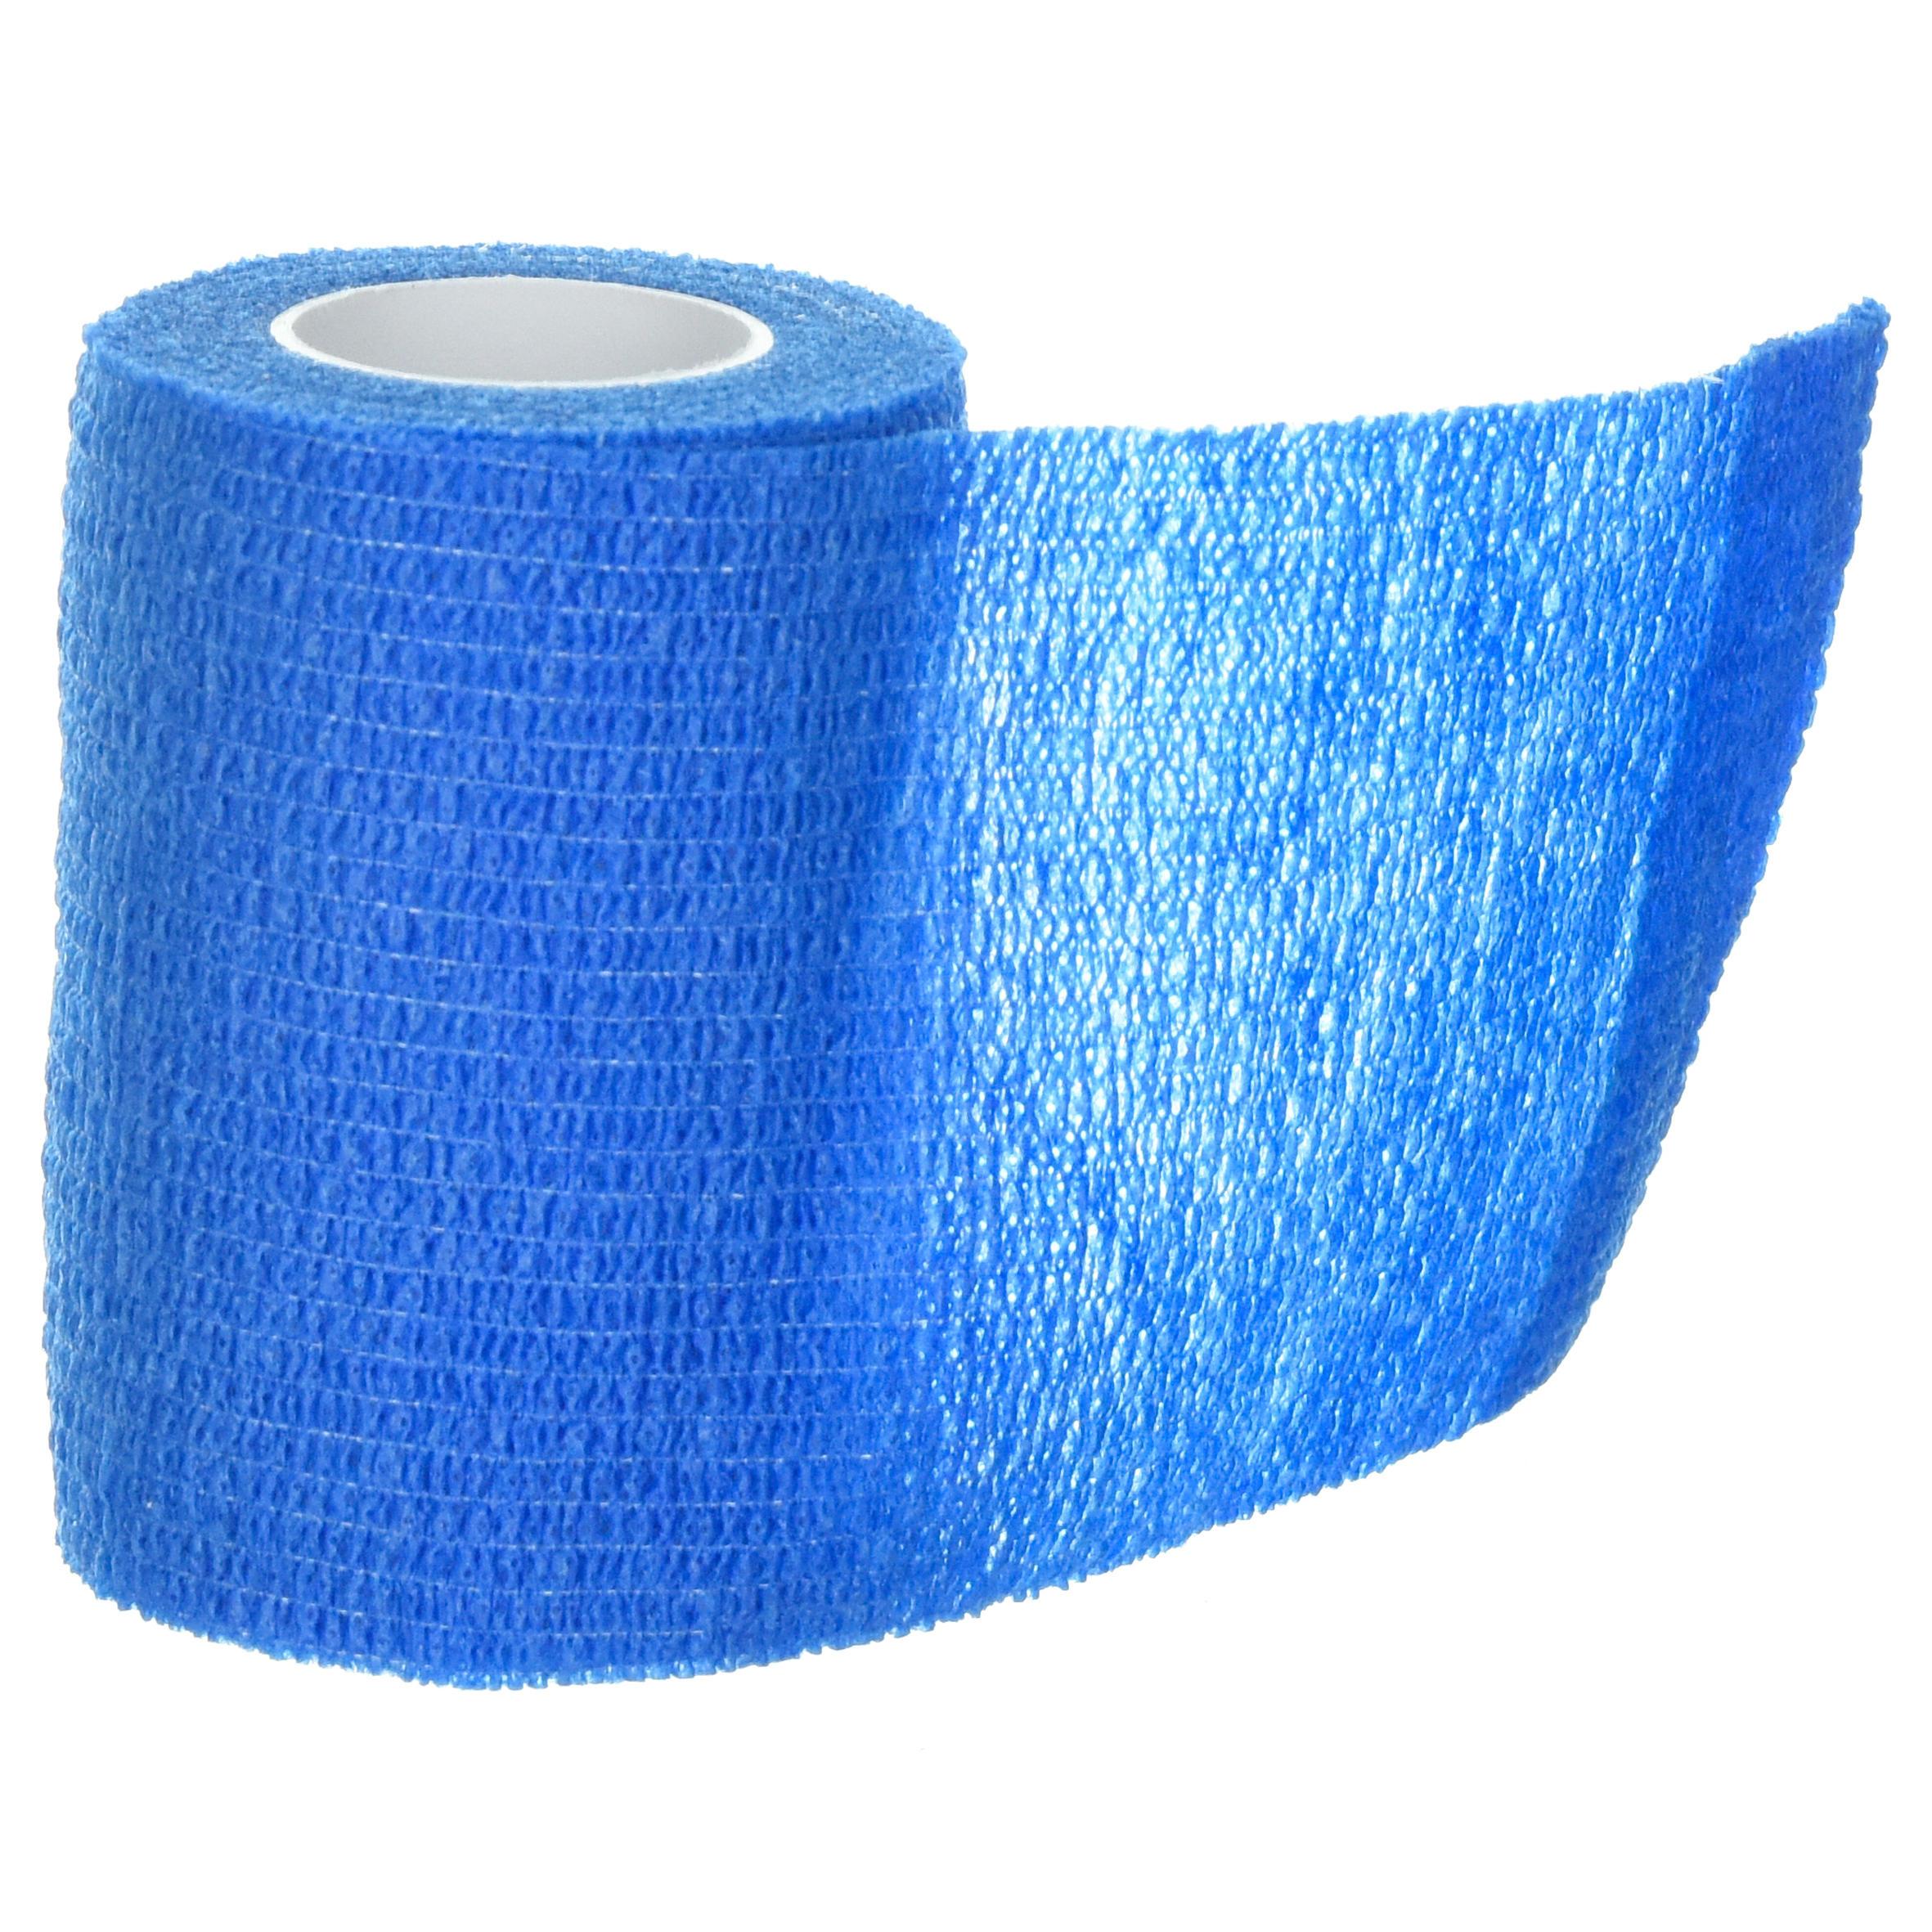 Venda elástica reutilizable azul